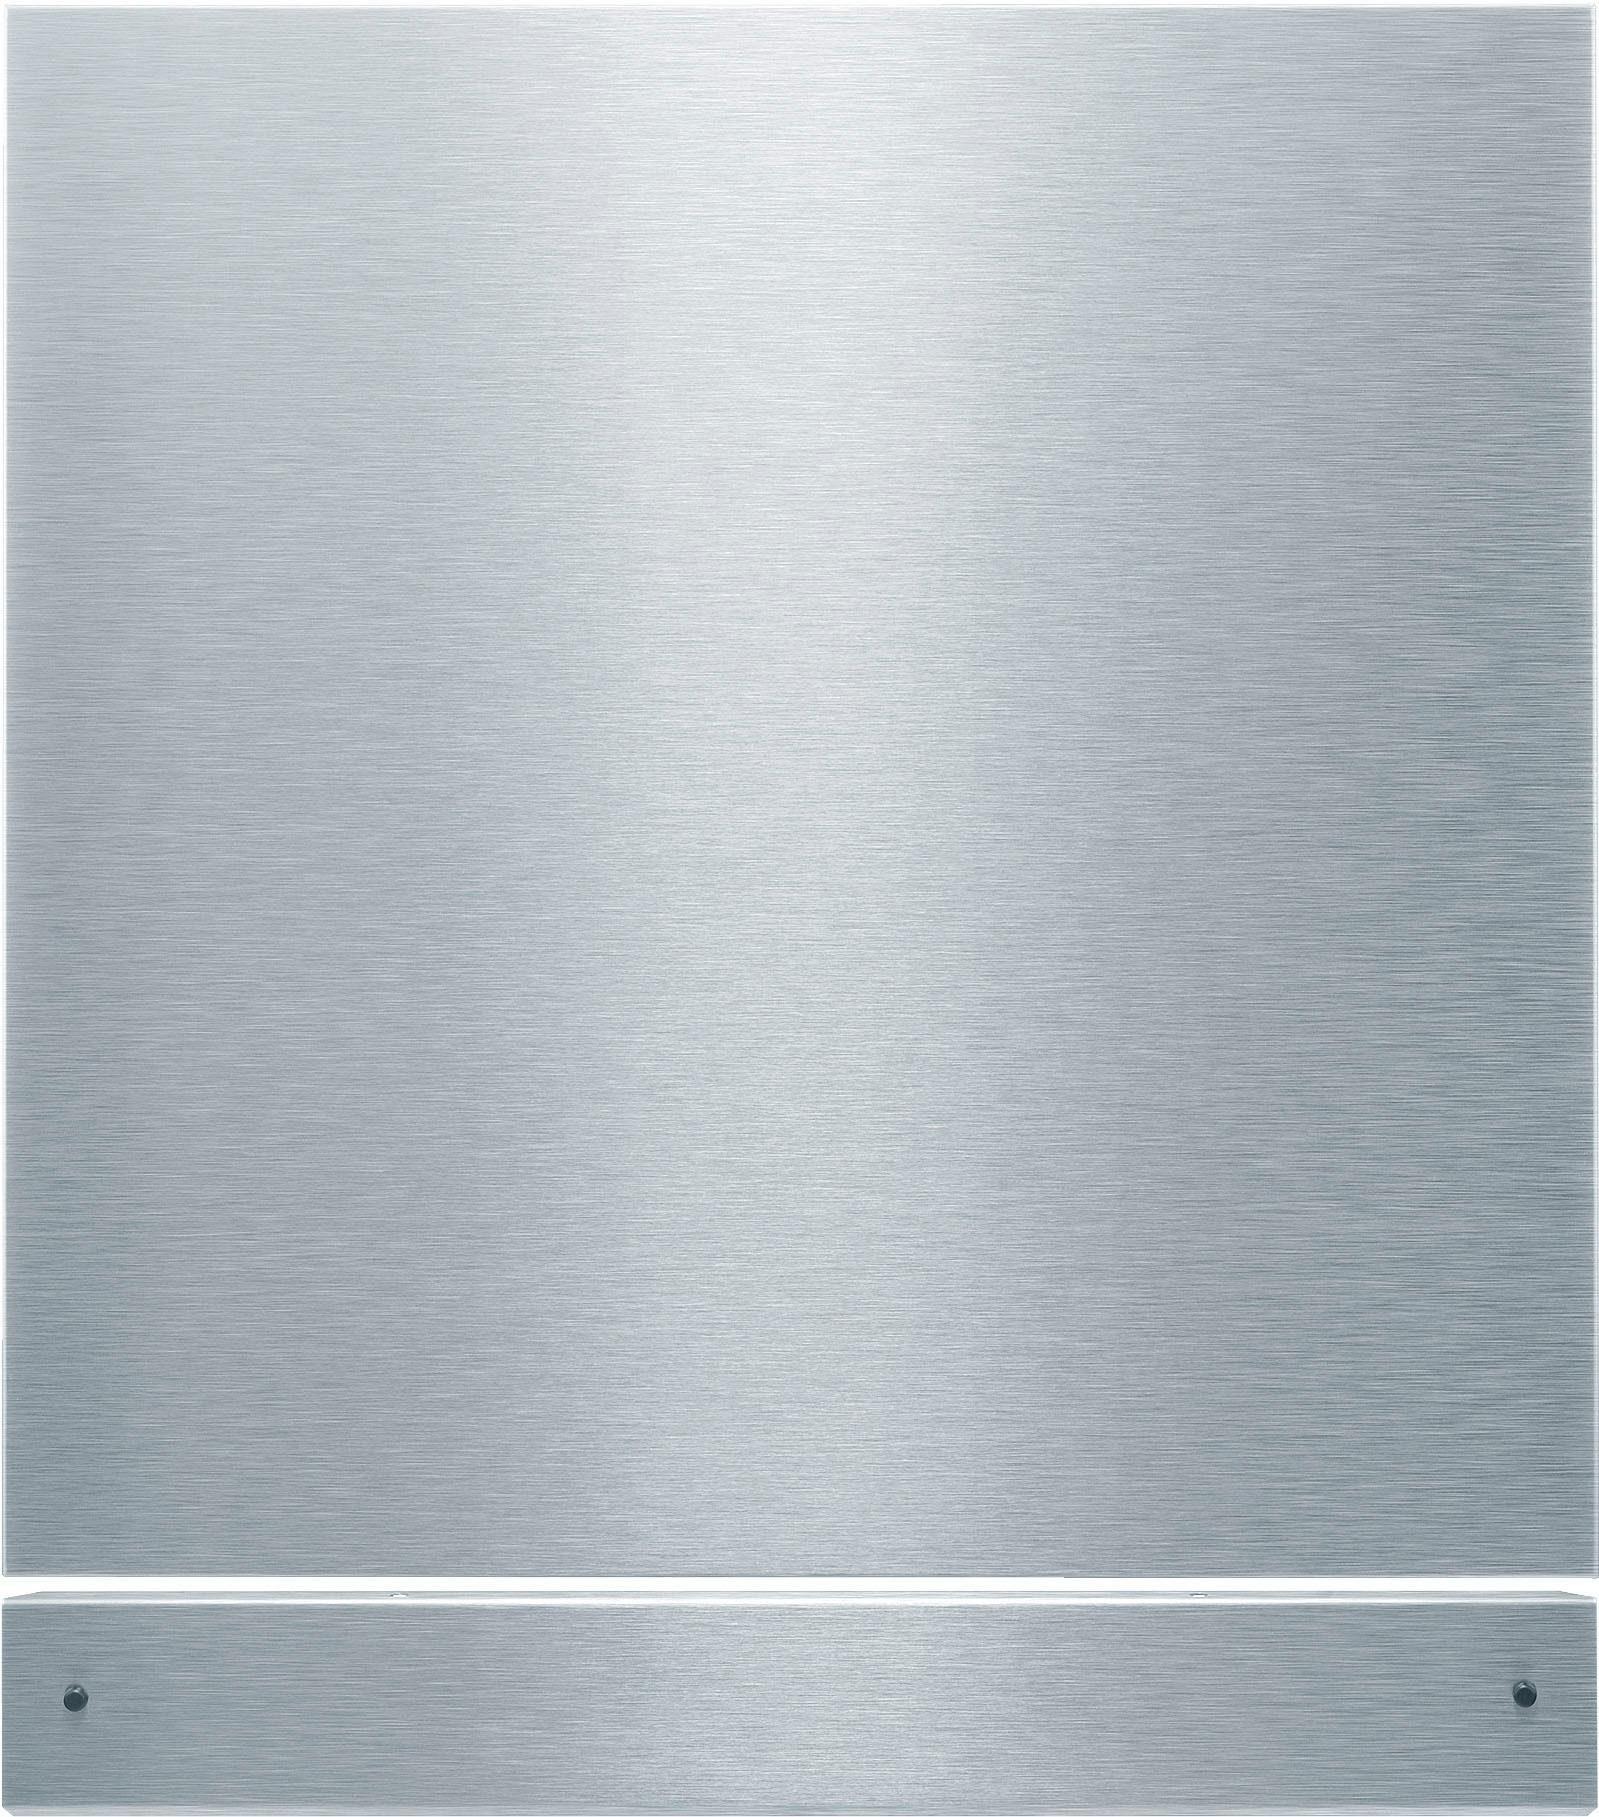 Bosch Sockelverkleidung + Tür Niro SMZ2044, für Geschirrspüler